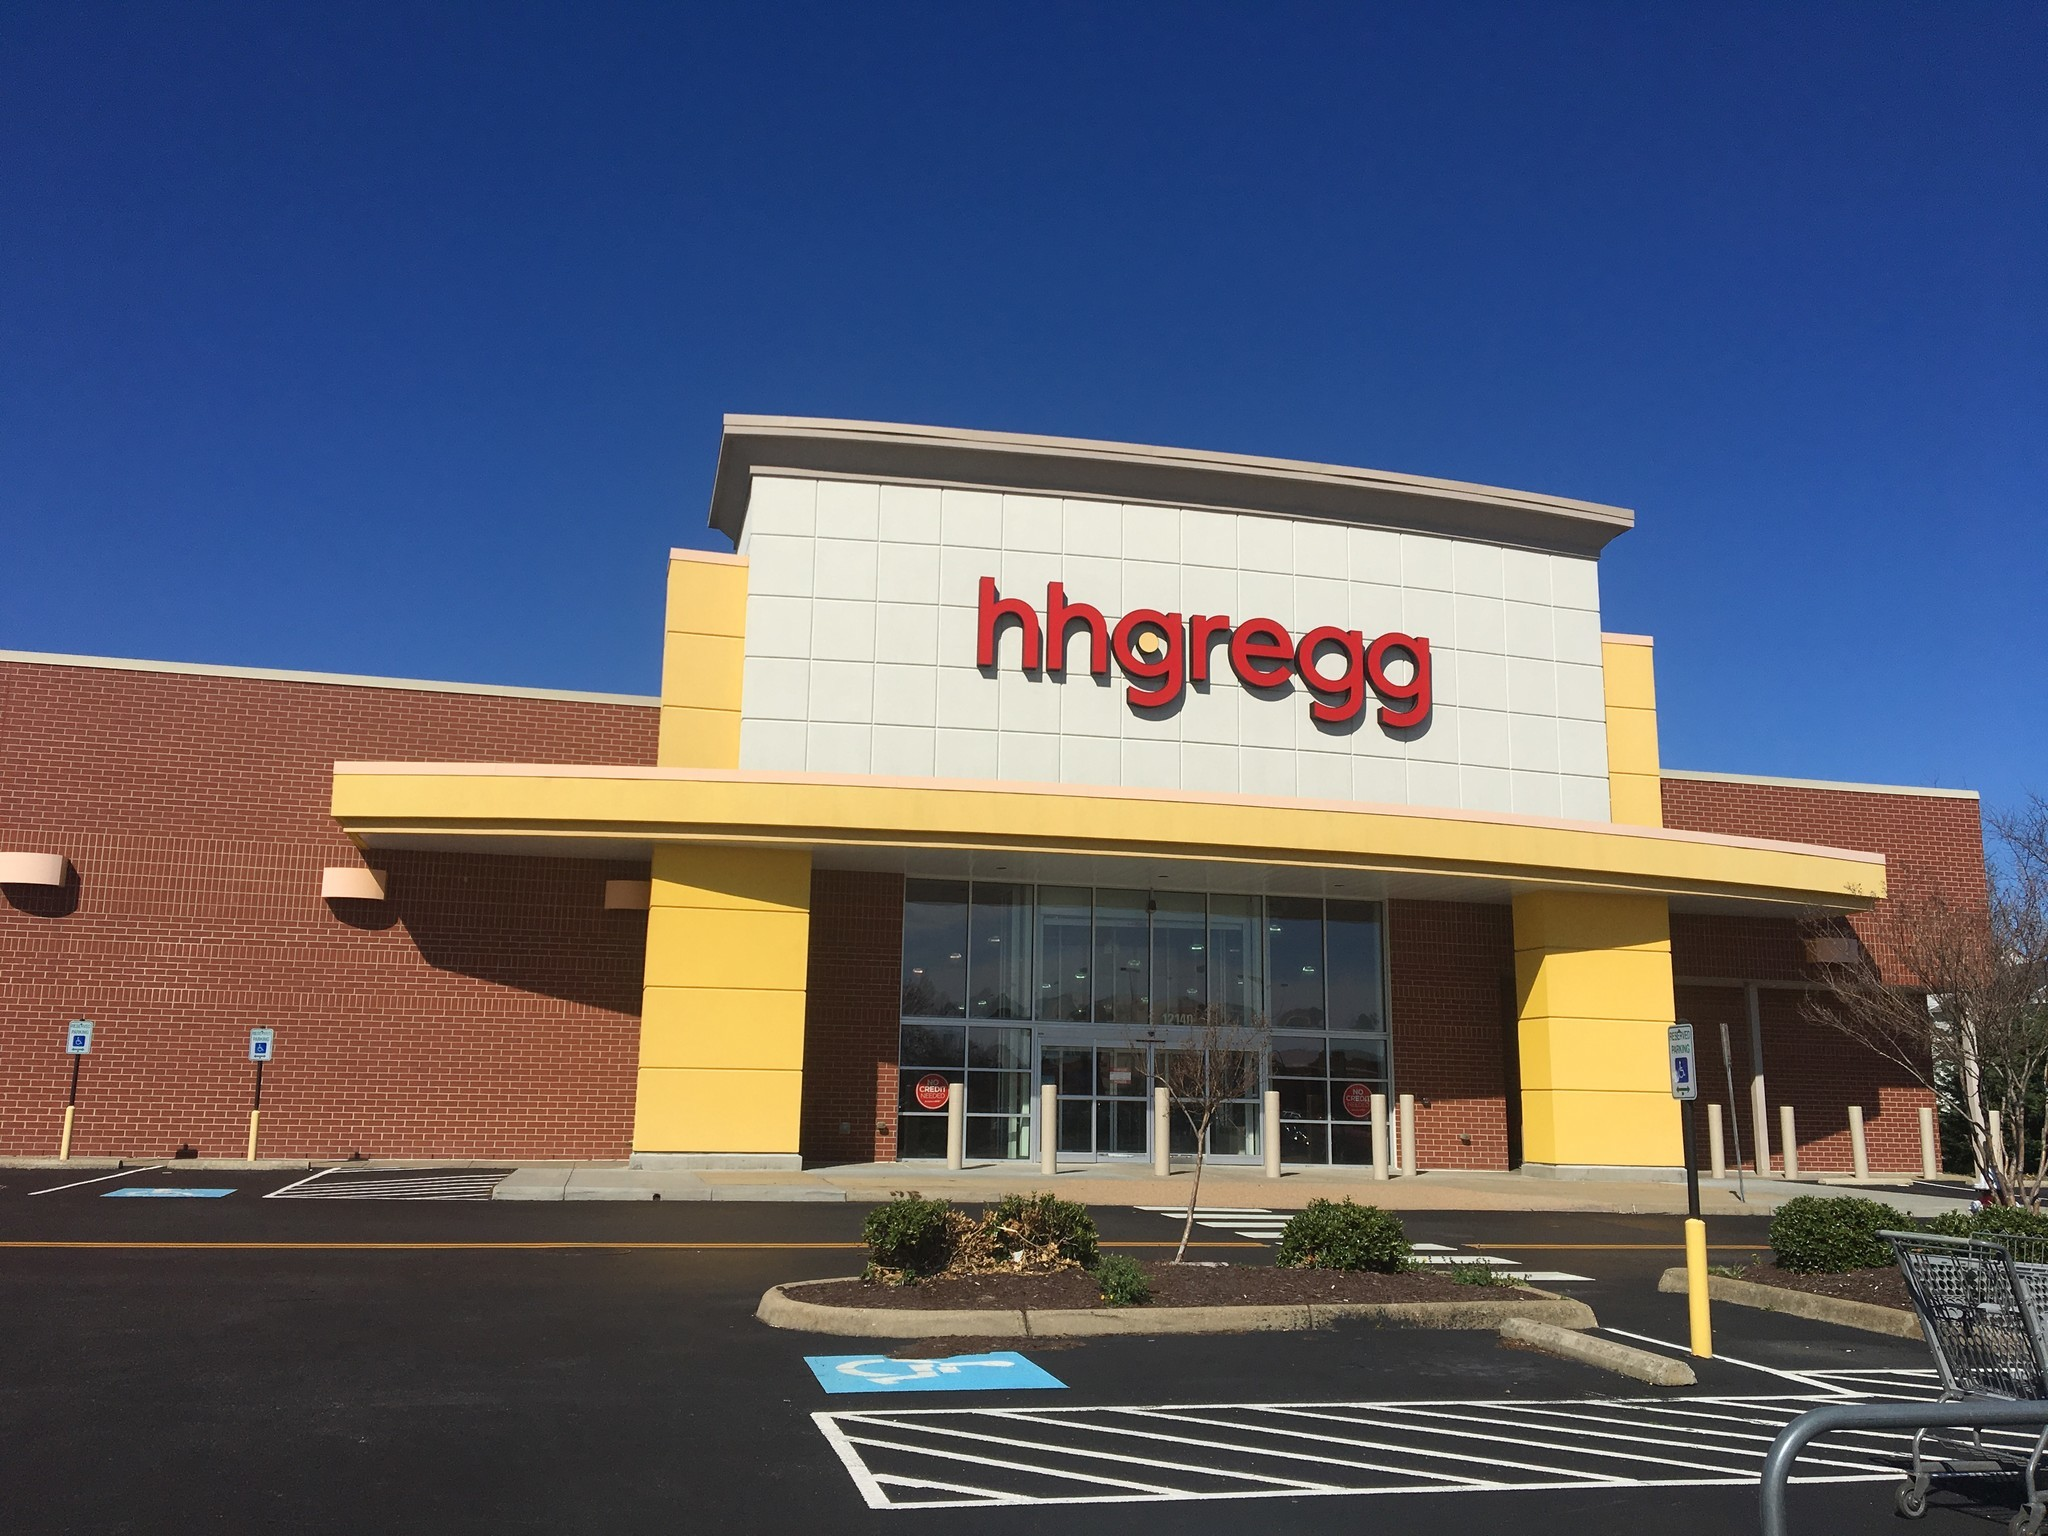 Hhgregg Closing Its Newport News Store Daily Press